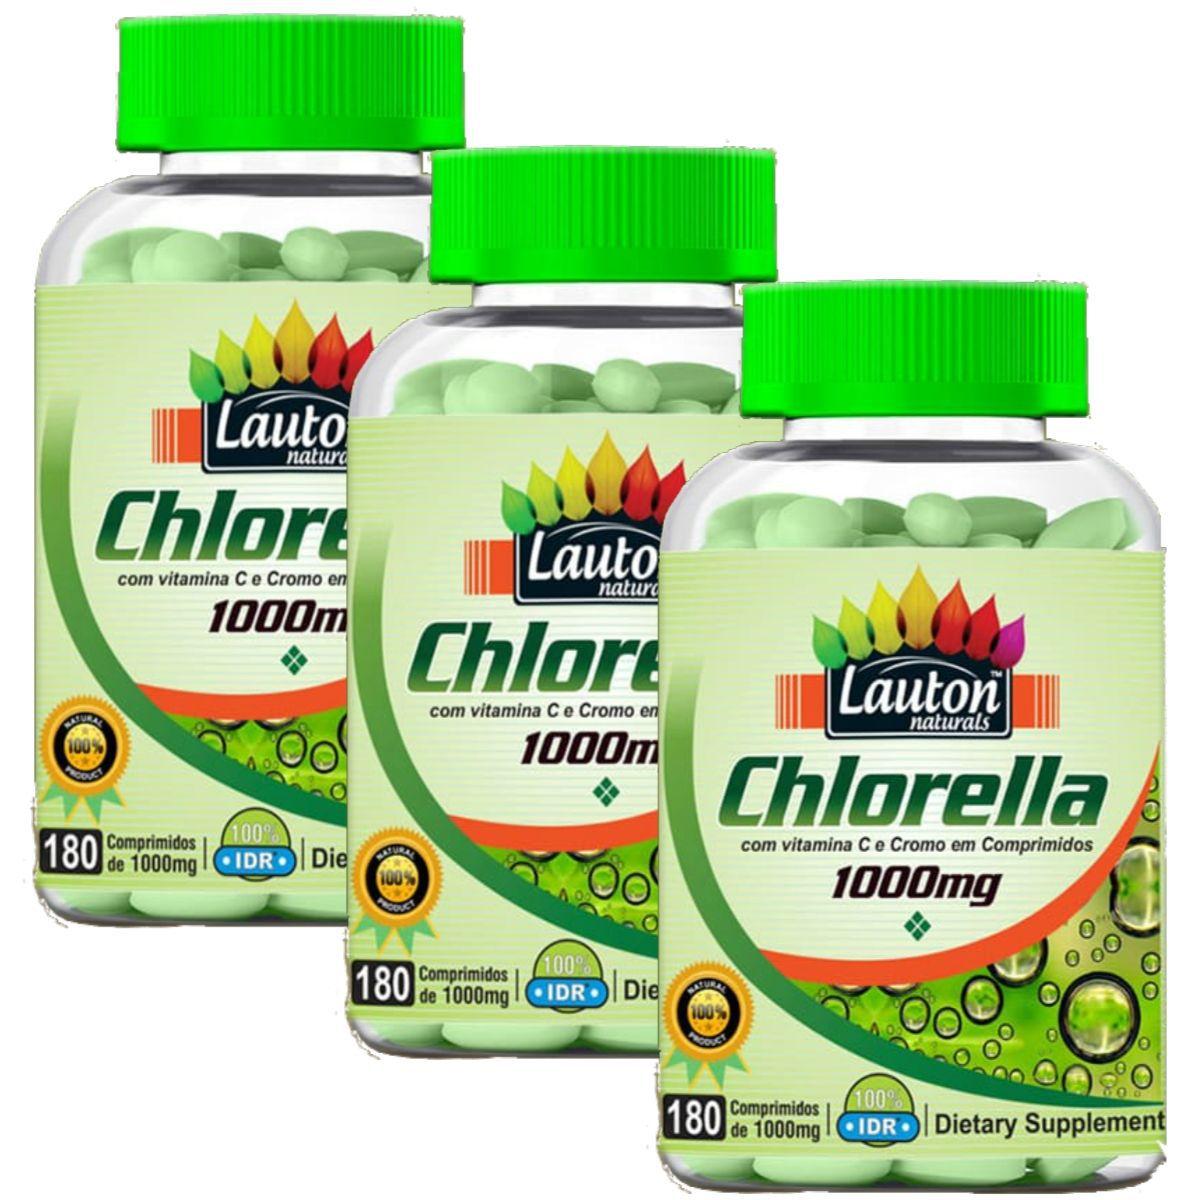 Kit 3 Chlorella Lauton Naturals - 1000mg 180 Comprimidos